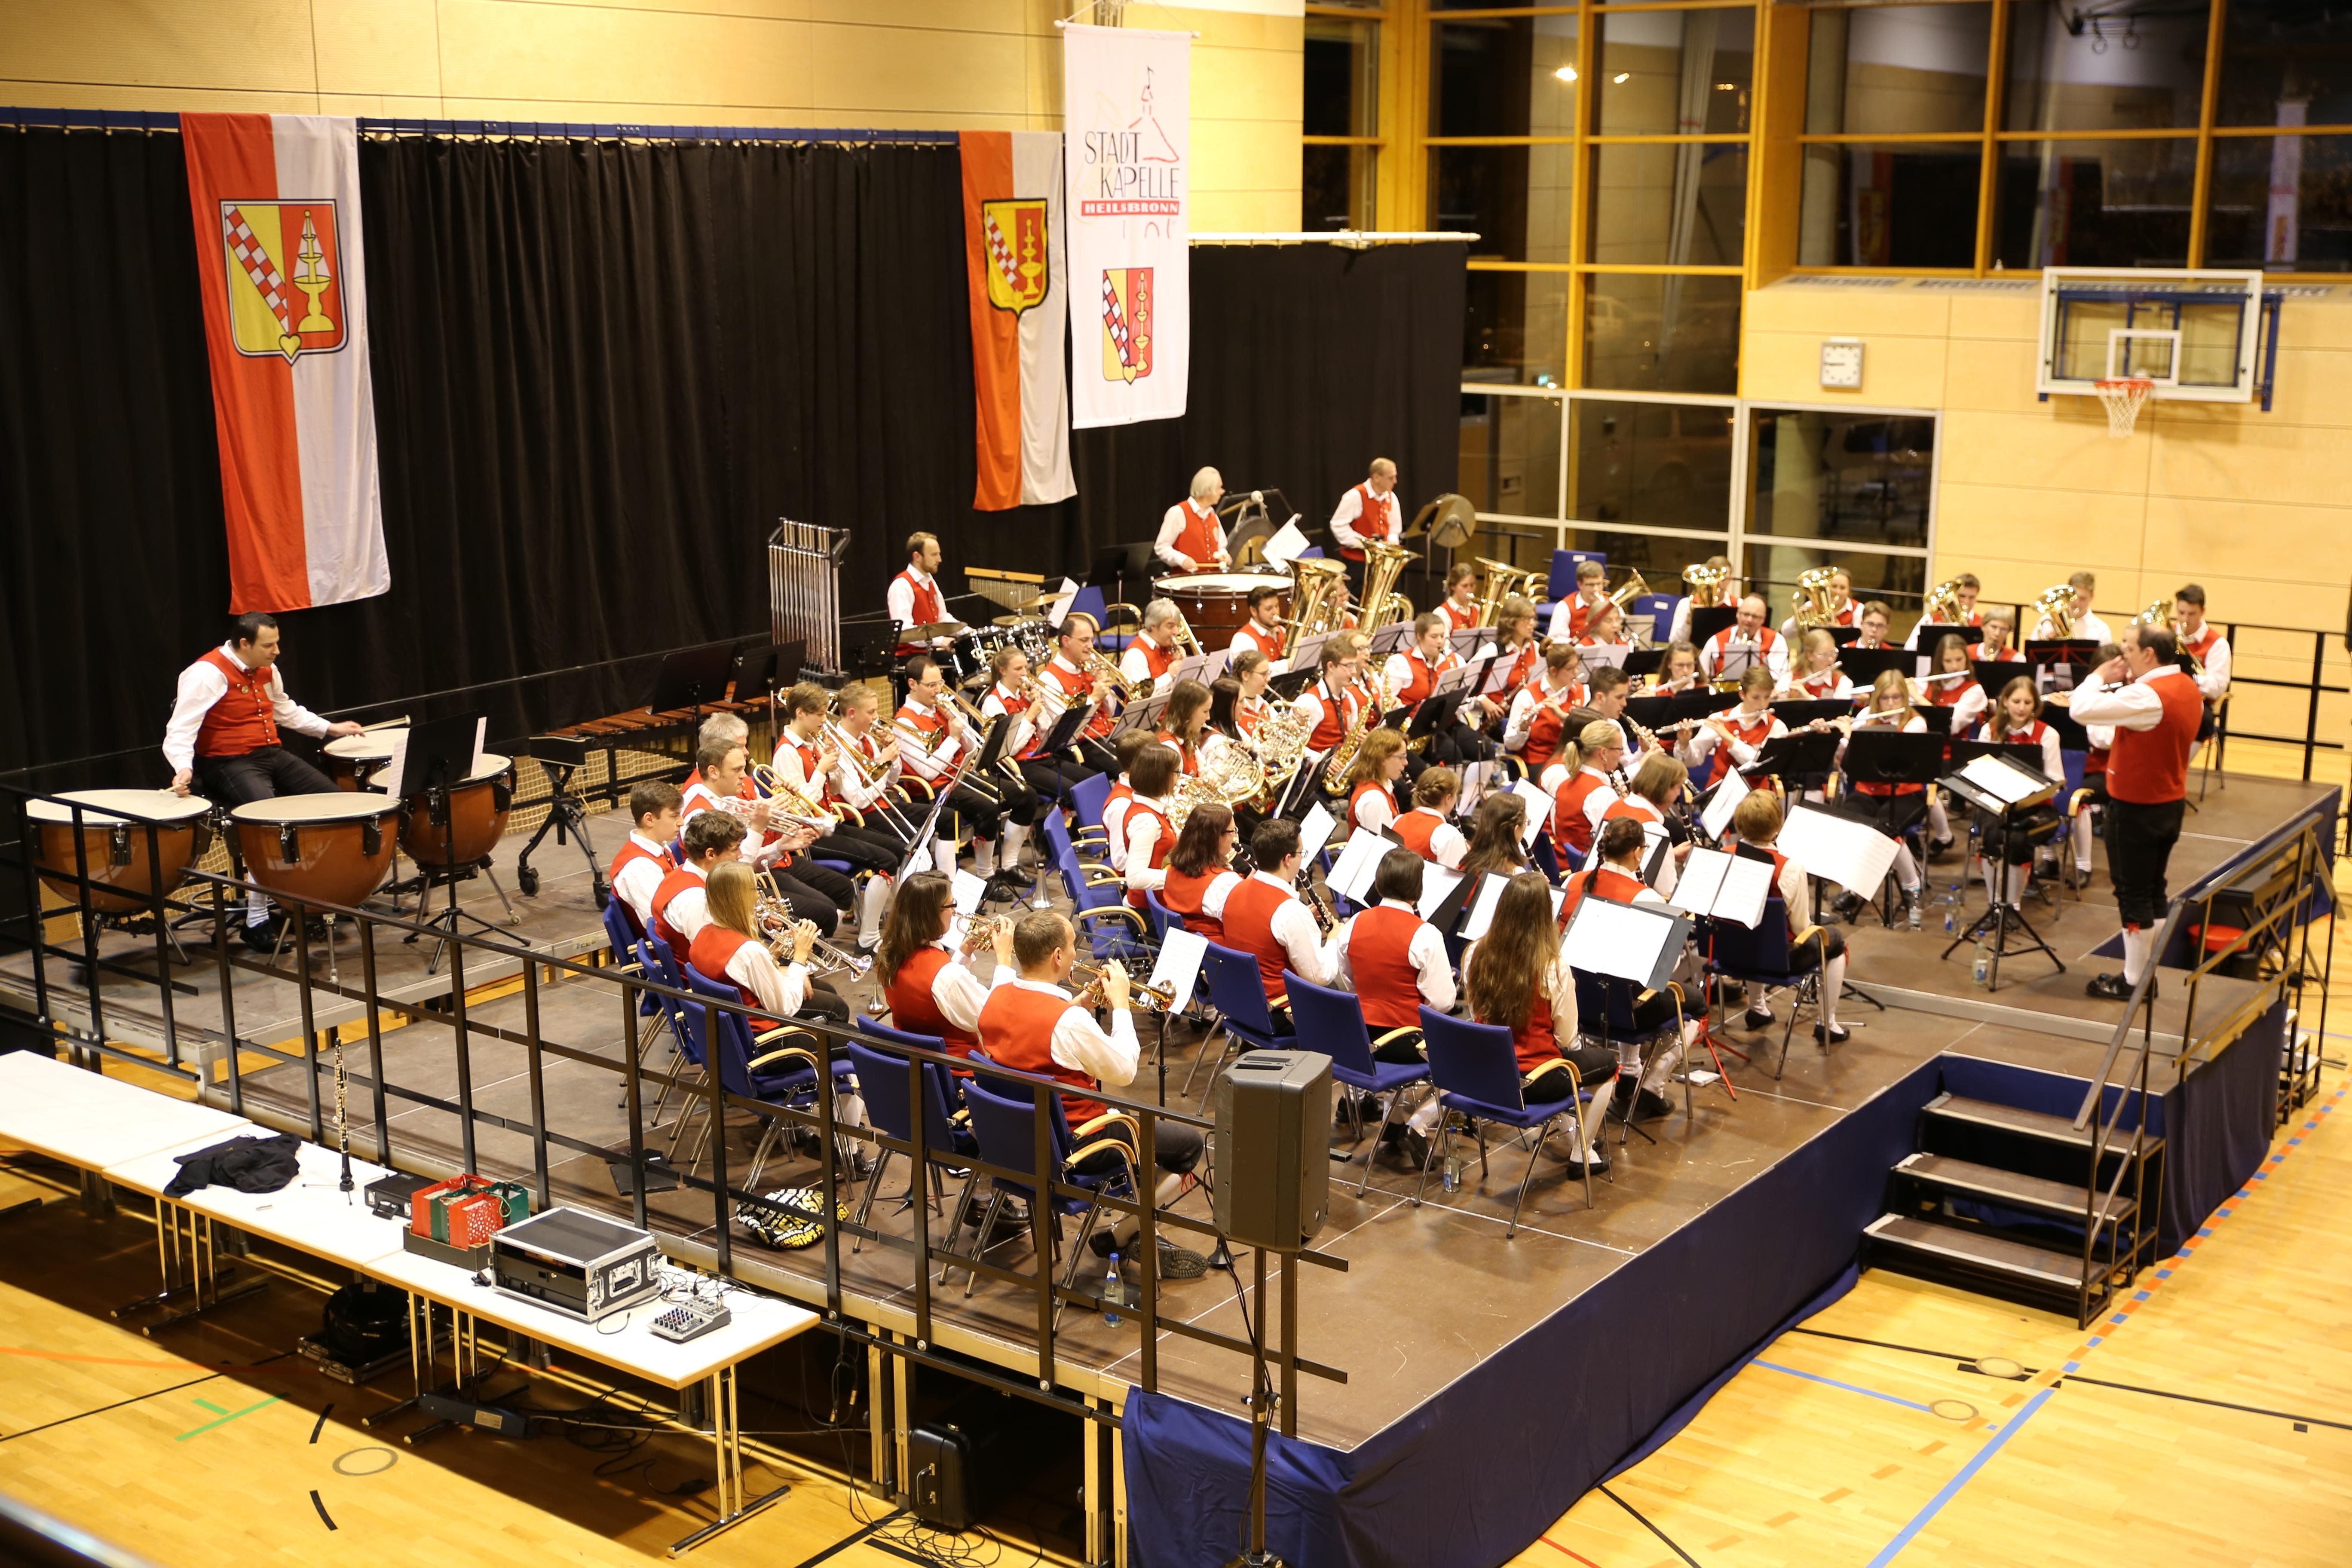 Herbstkonzert 2016 der Stadtkapelle Heilsbronn e. V.